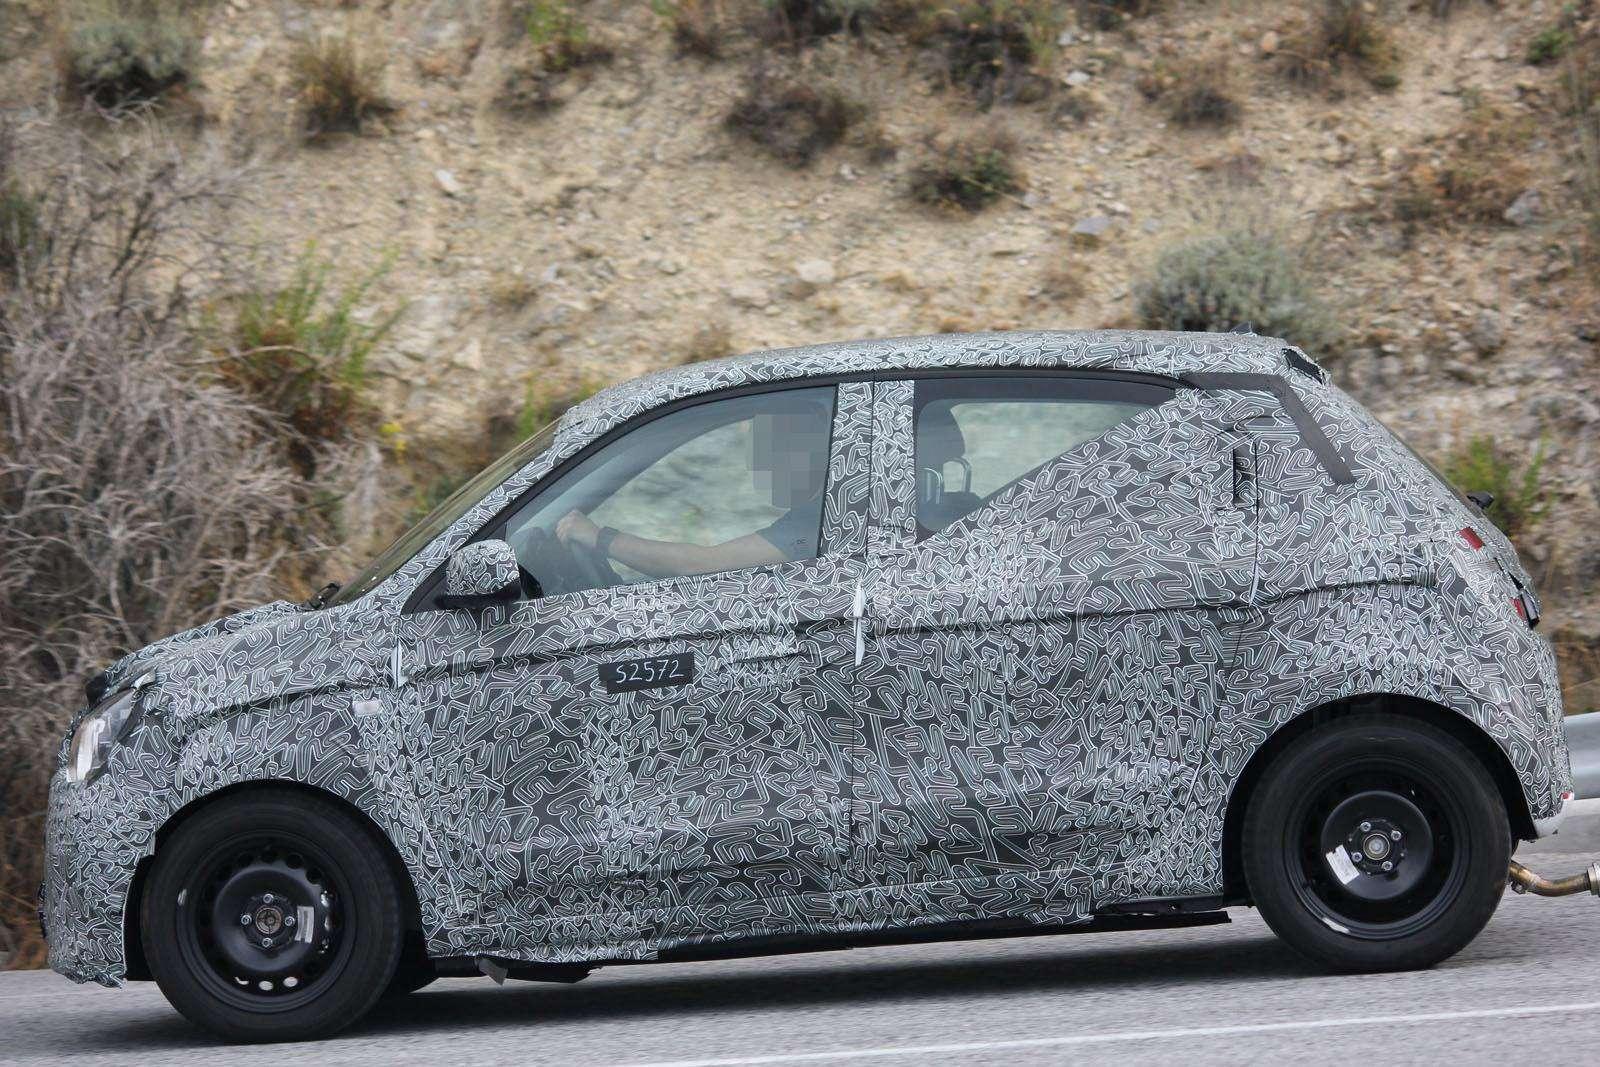 Renault Twingo 2015 Spy Photos